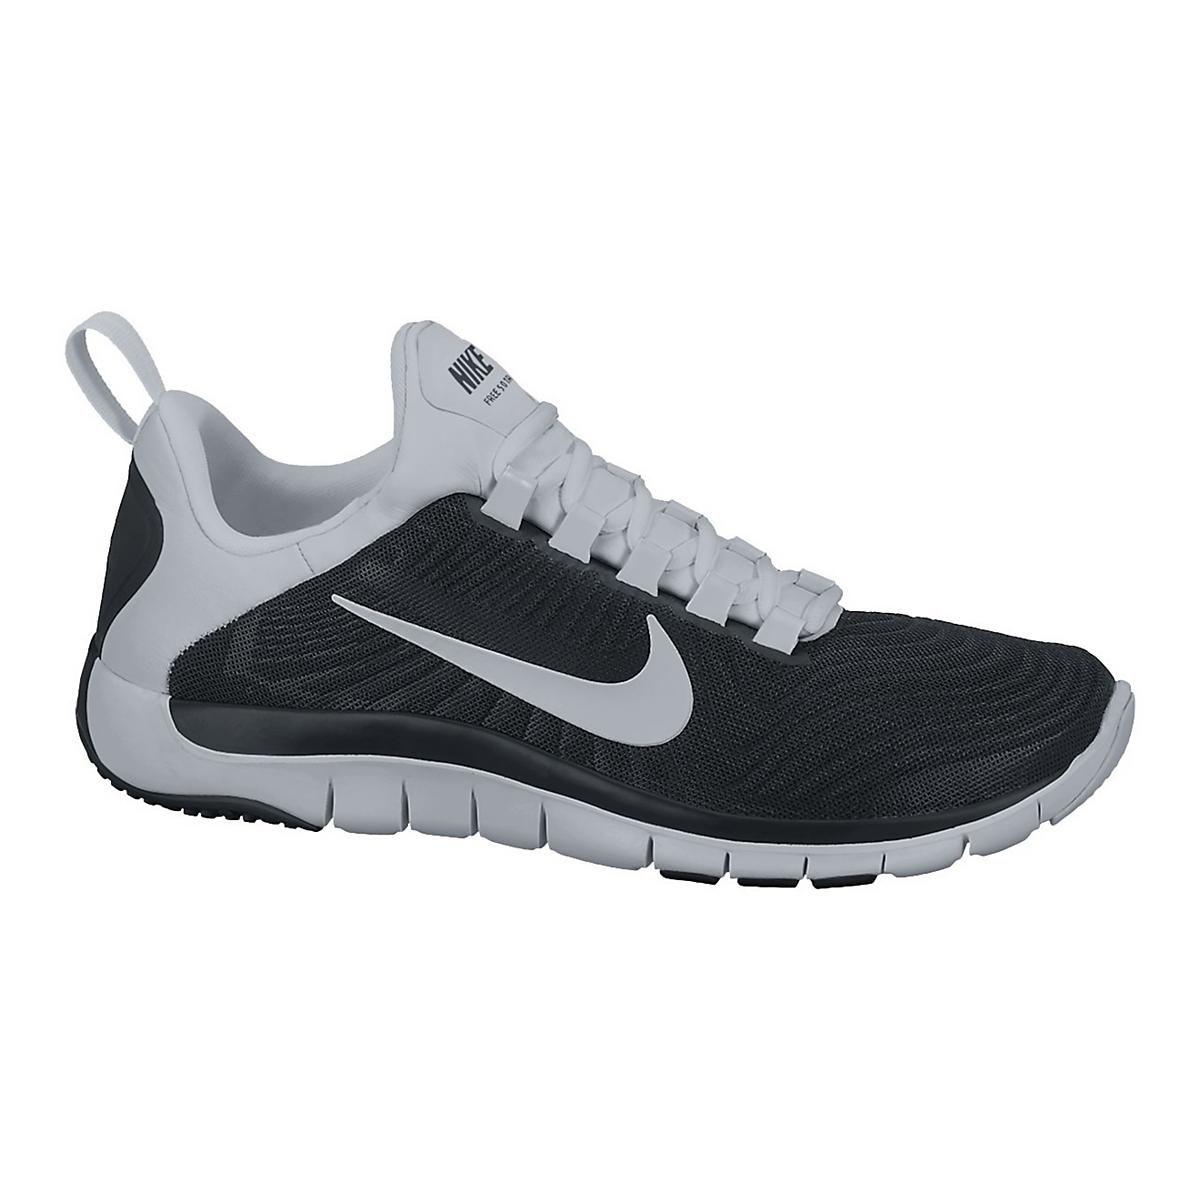 Mens Nike Free Trainer 5.0 Cross